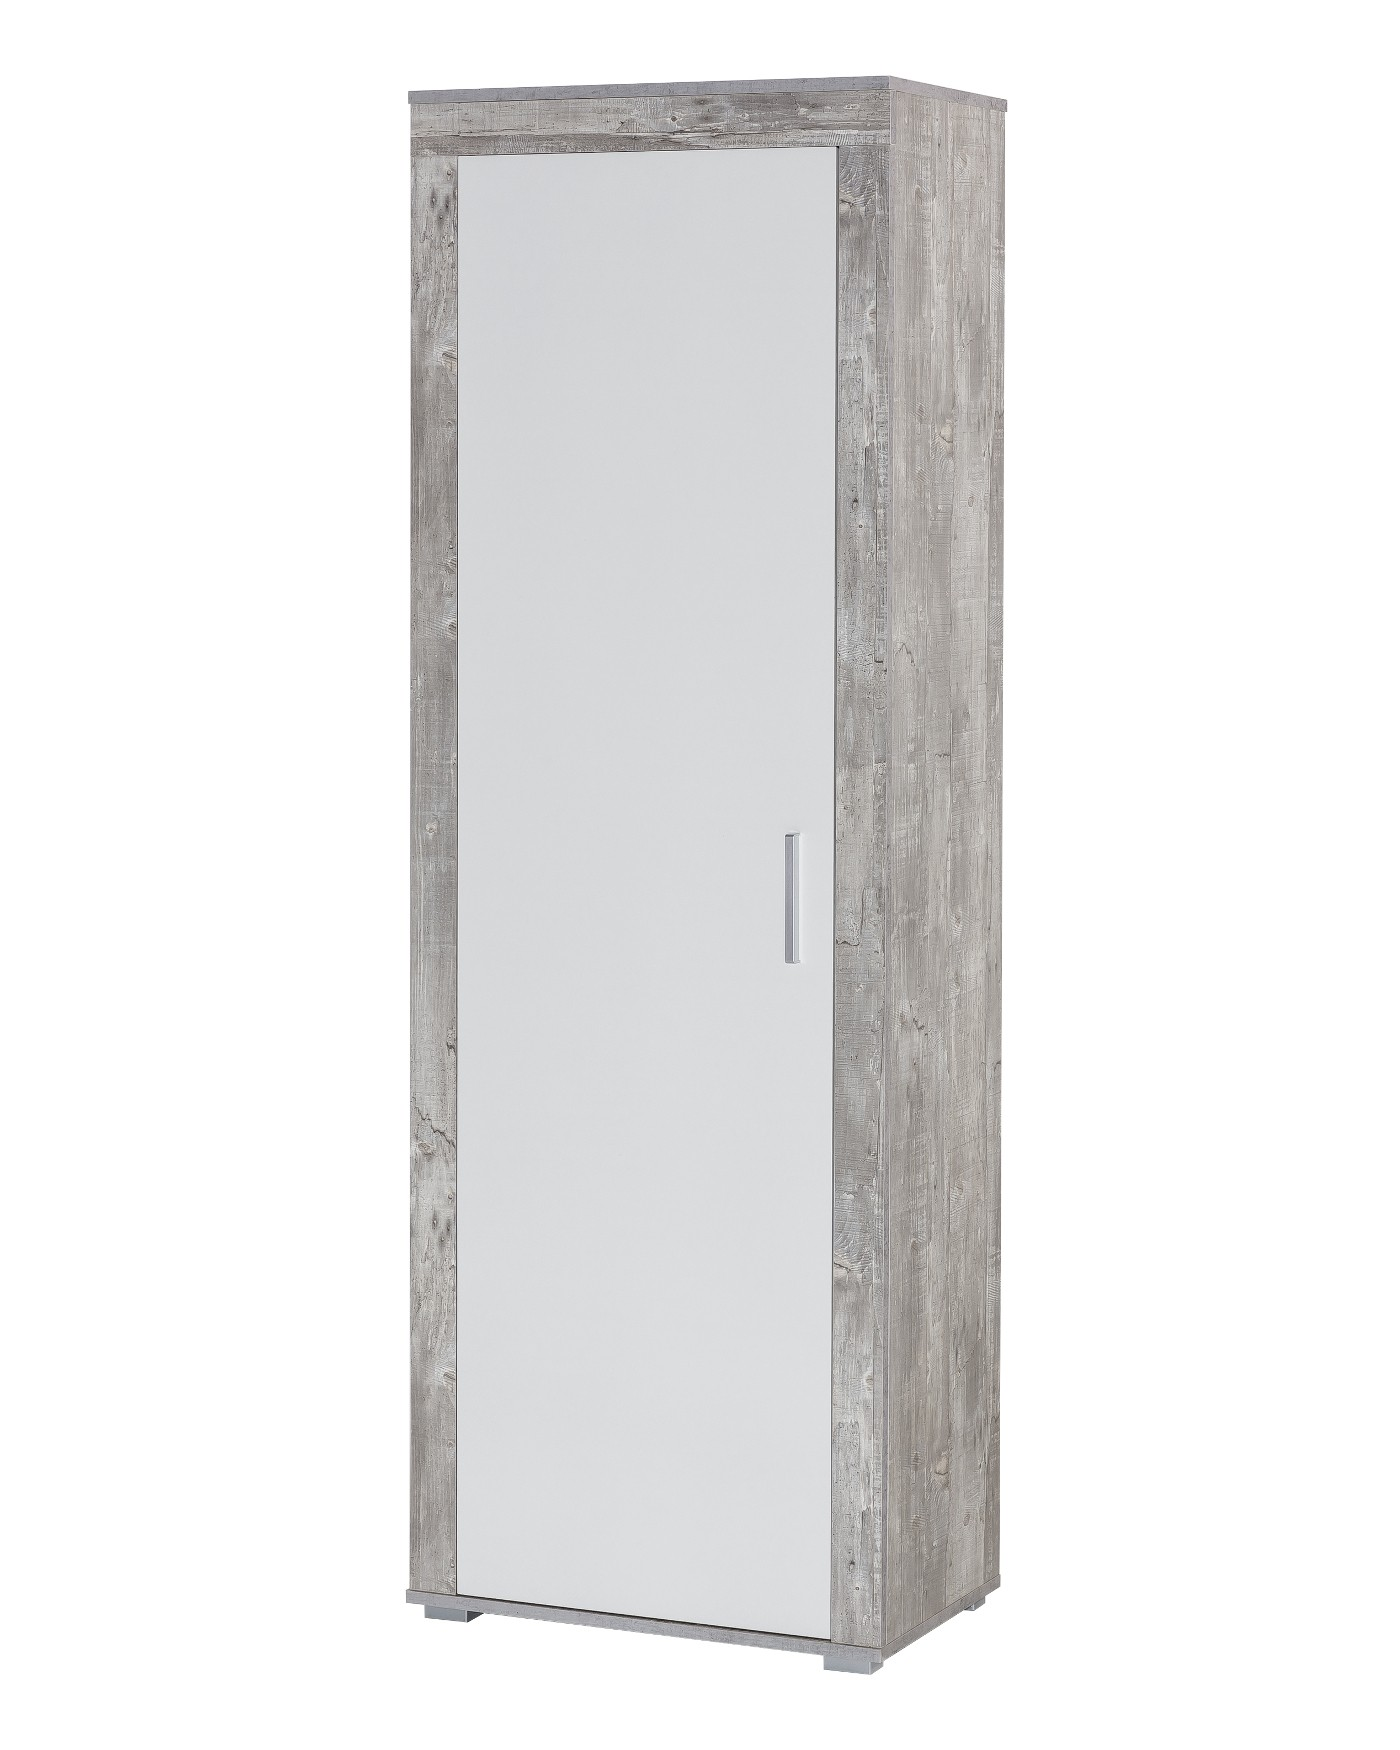 garderobenset lake 130 cm breit 3 teilig wei beton. Black Bedroom Furniture Sets. Home Design Ideas